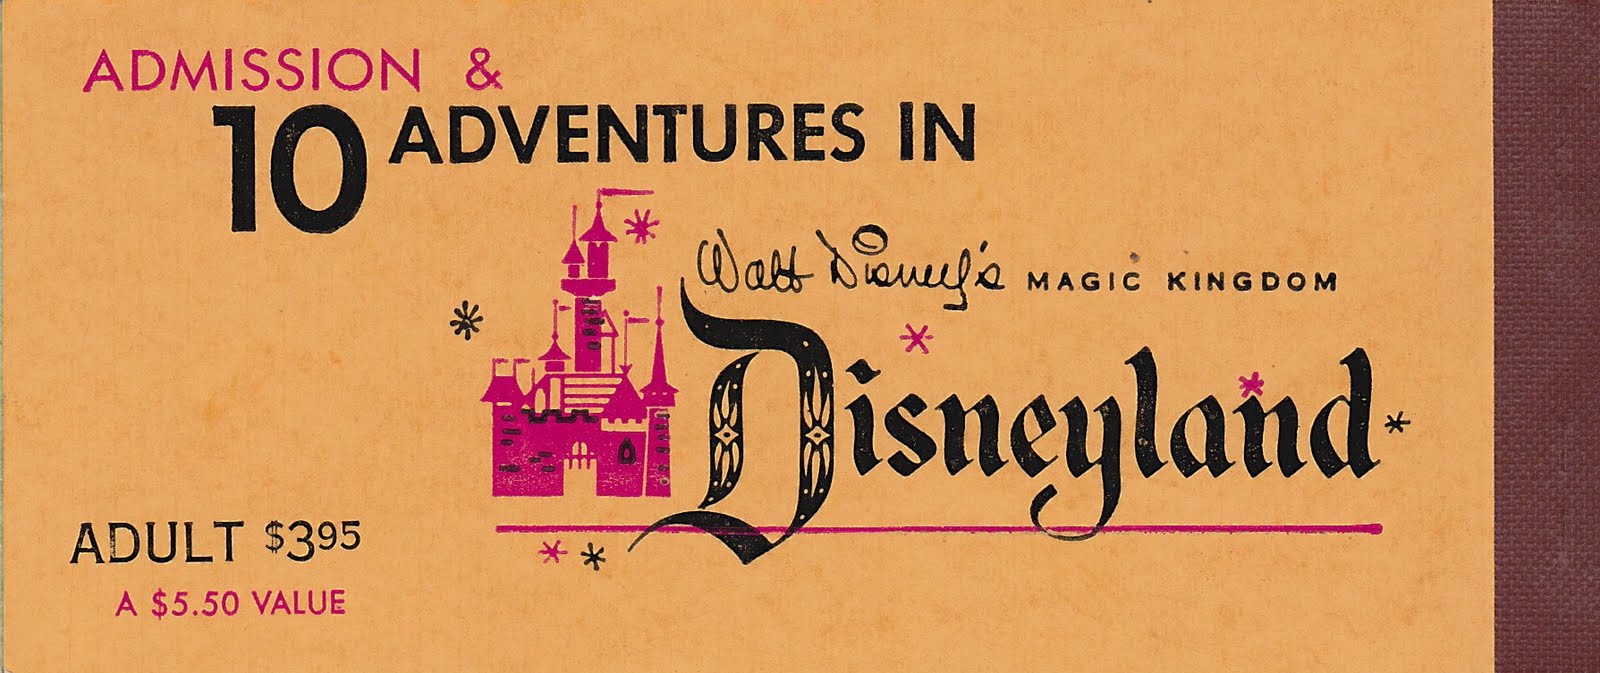 Jim Fannings Tulgey Wood A Ticket Book To Ride For Disneylands Tiket Disneyland Hongkong Open Date Anniversary